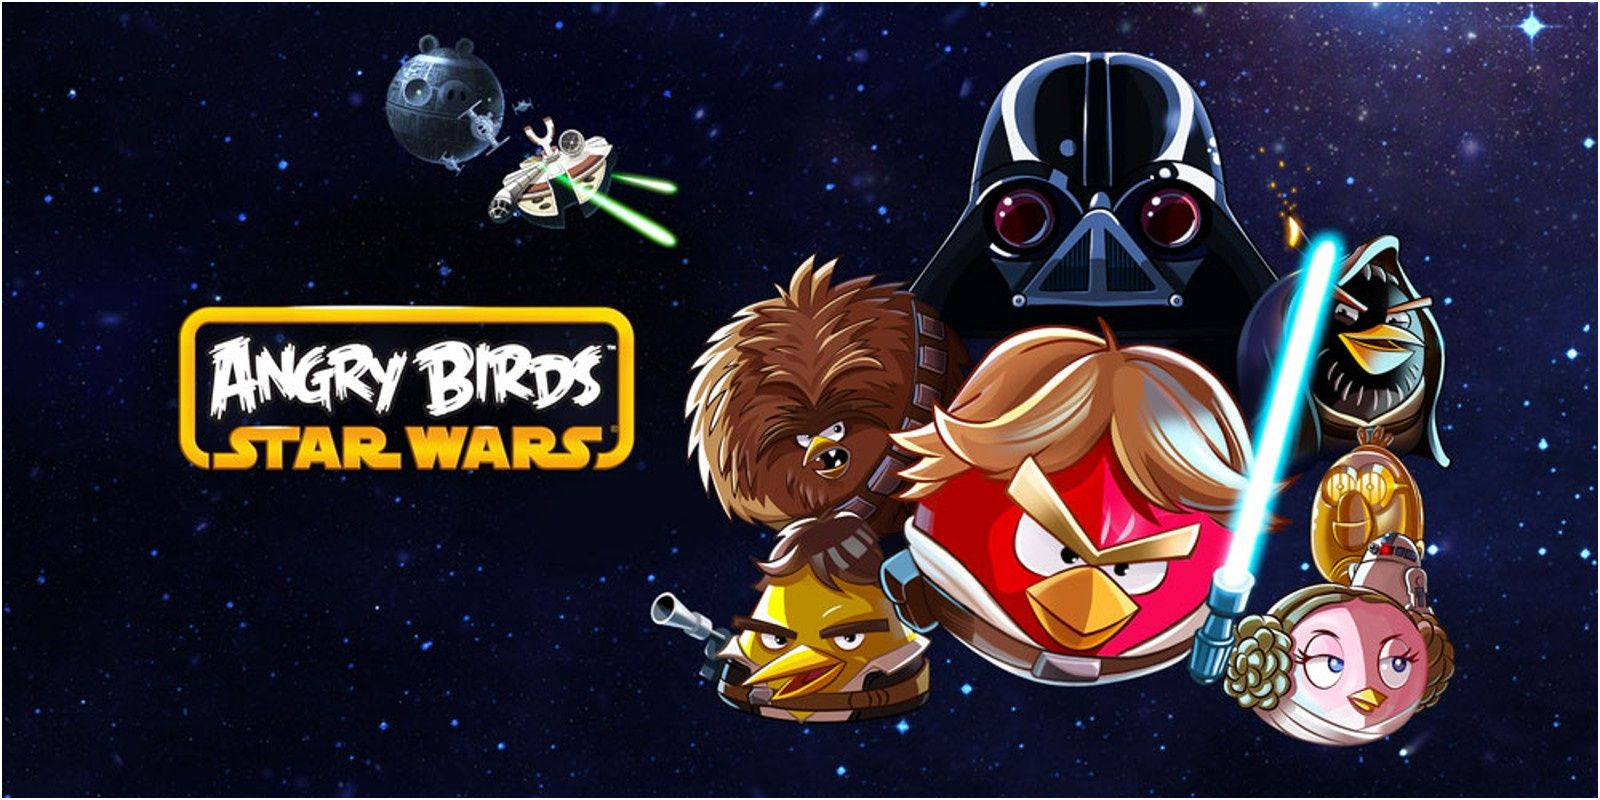 Angry Birds Star Wars Angrybirds Angry Birds Star Wars Birds